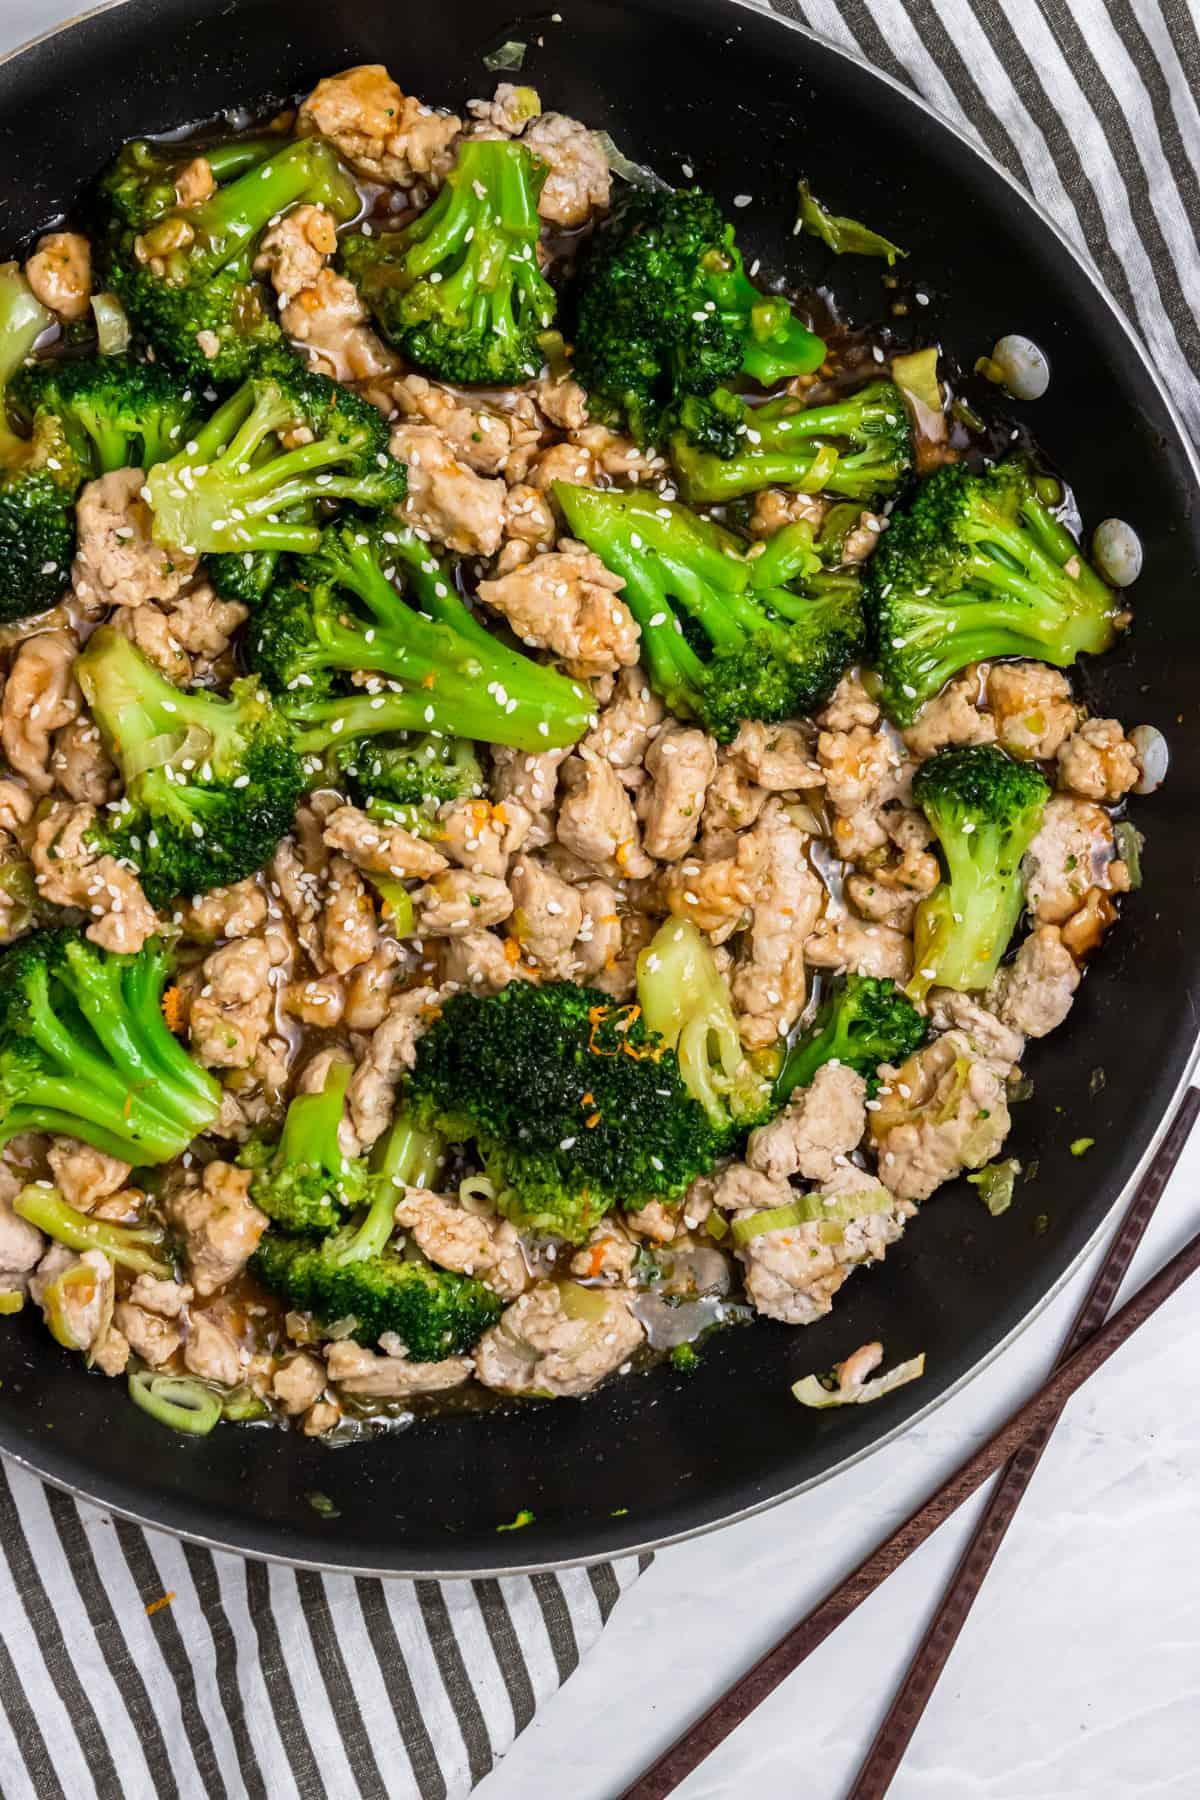 Ground turkey teriyaki in skillet with broccoli and chopsticks.